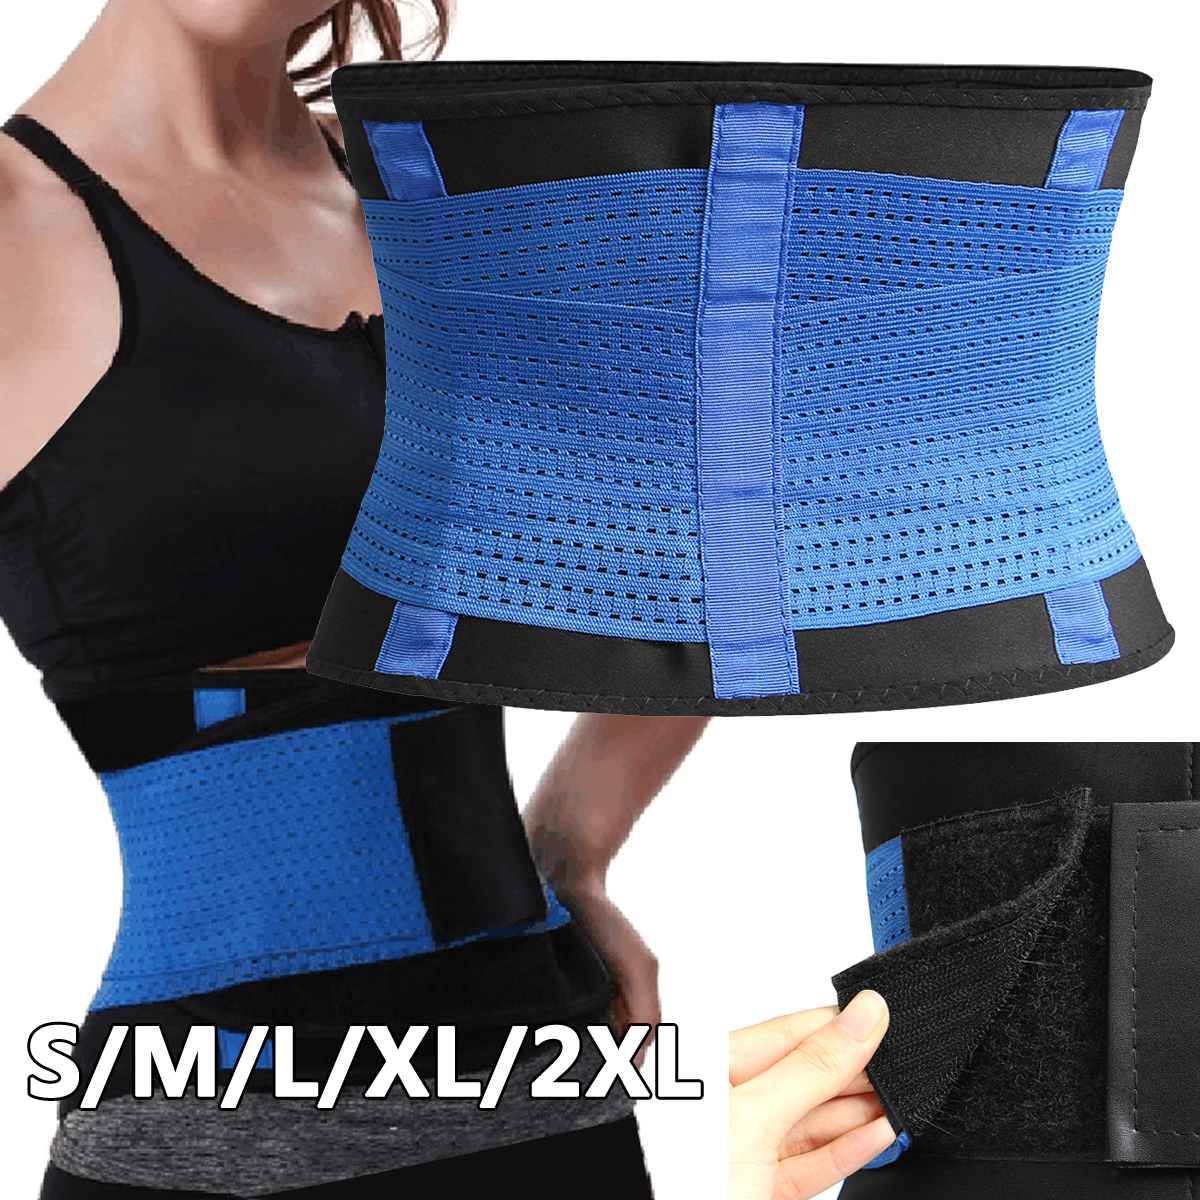 Women Medical Lower Back Brace Waist Belt Spine Support Men Belts Breathable Lumbar Corset Orthopedic Back Support